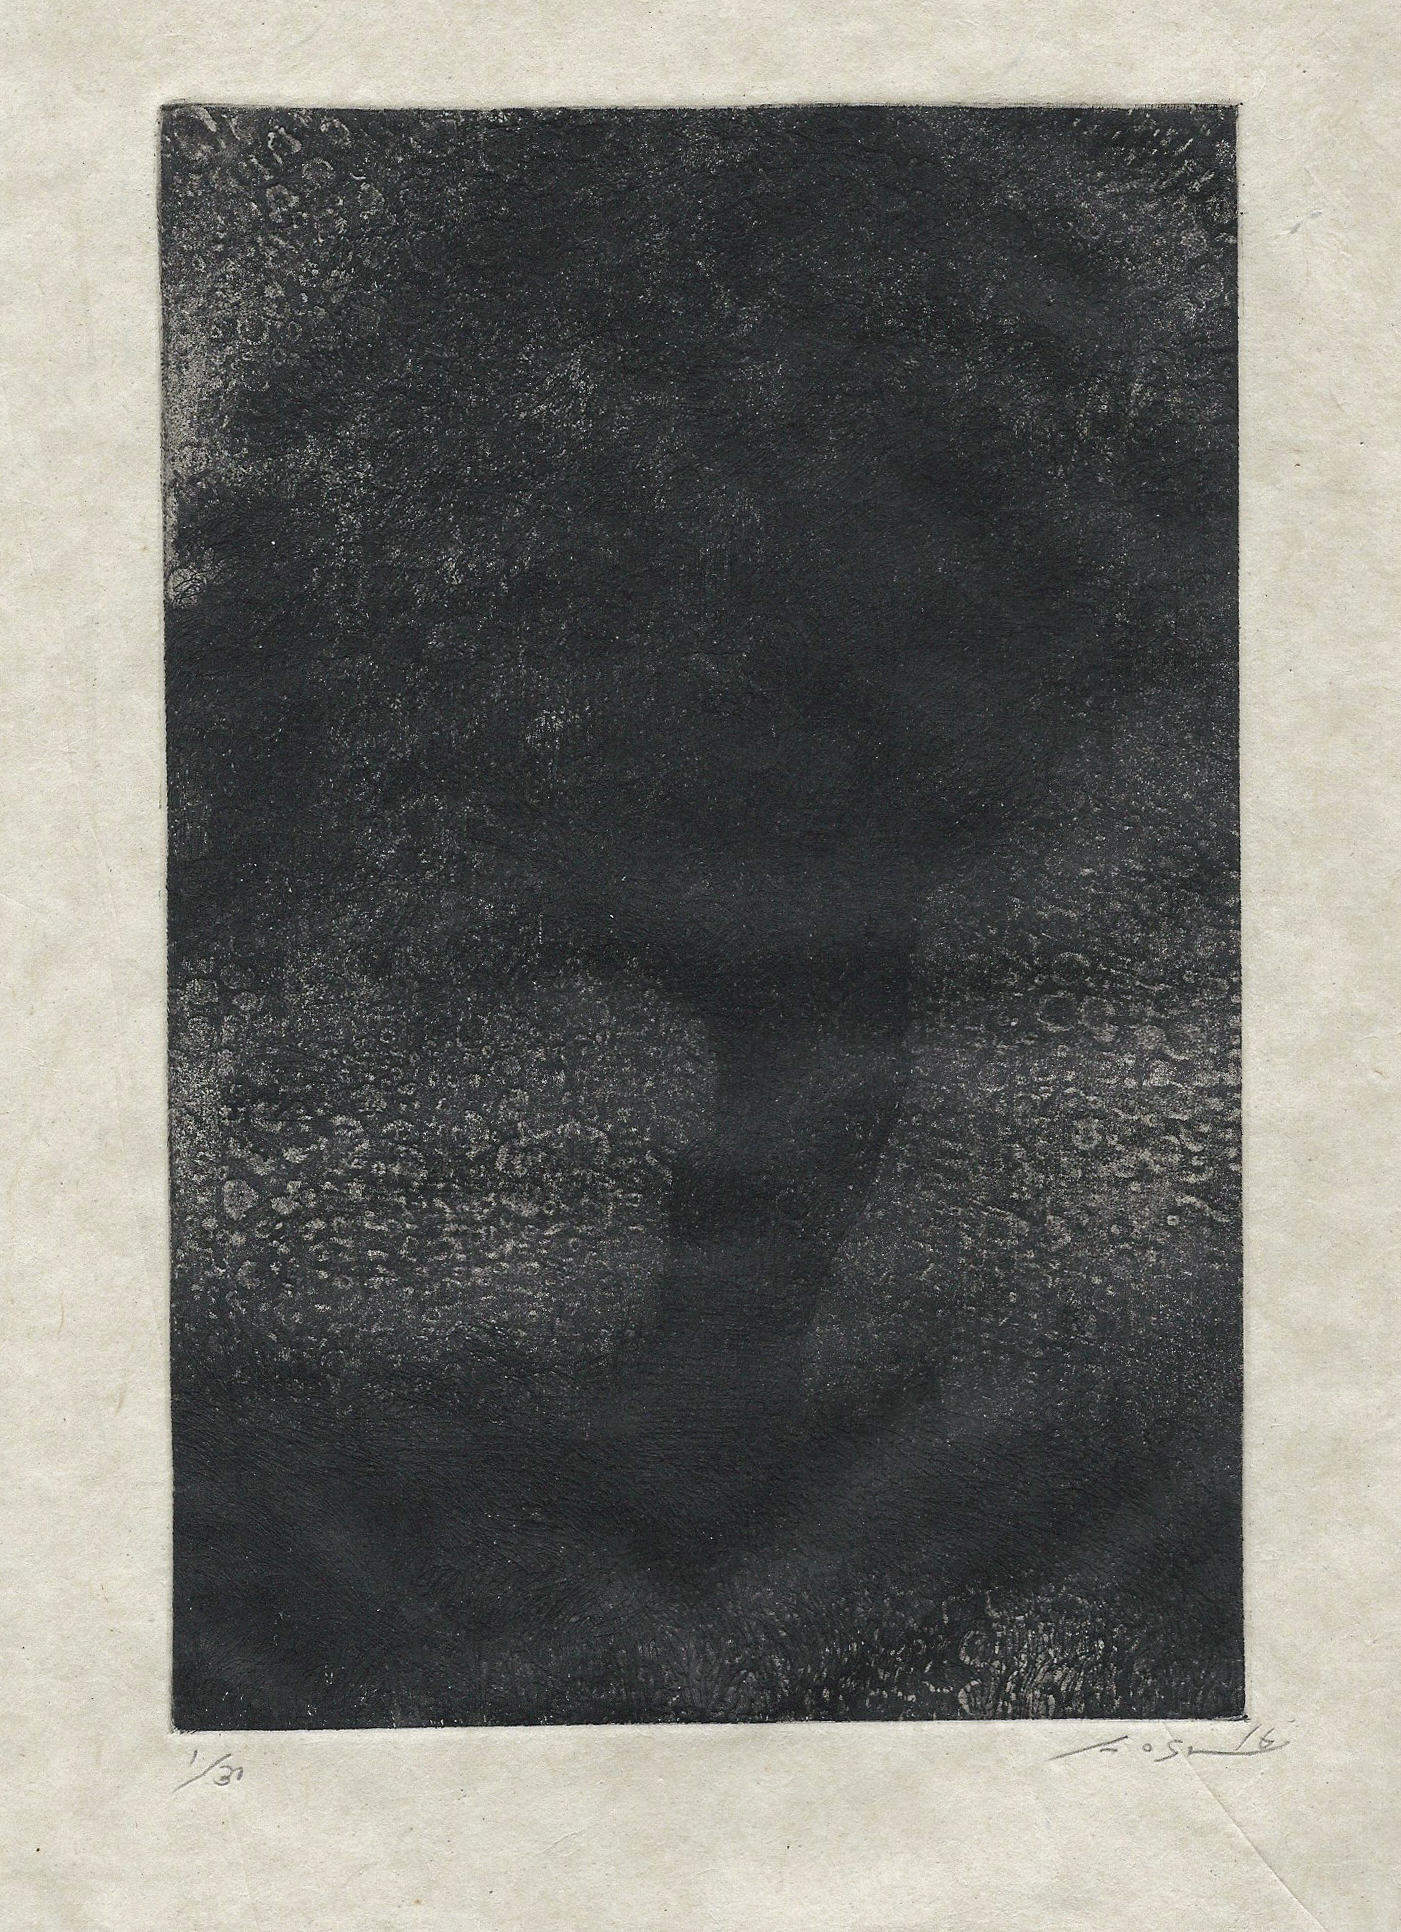 Masaki Nose | A SHAKING TREE | etching, aquatint | 8x6 | 2016